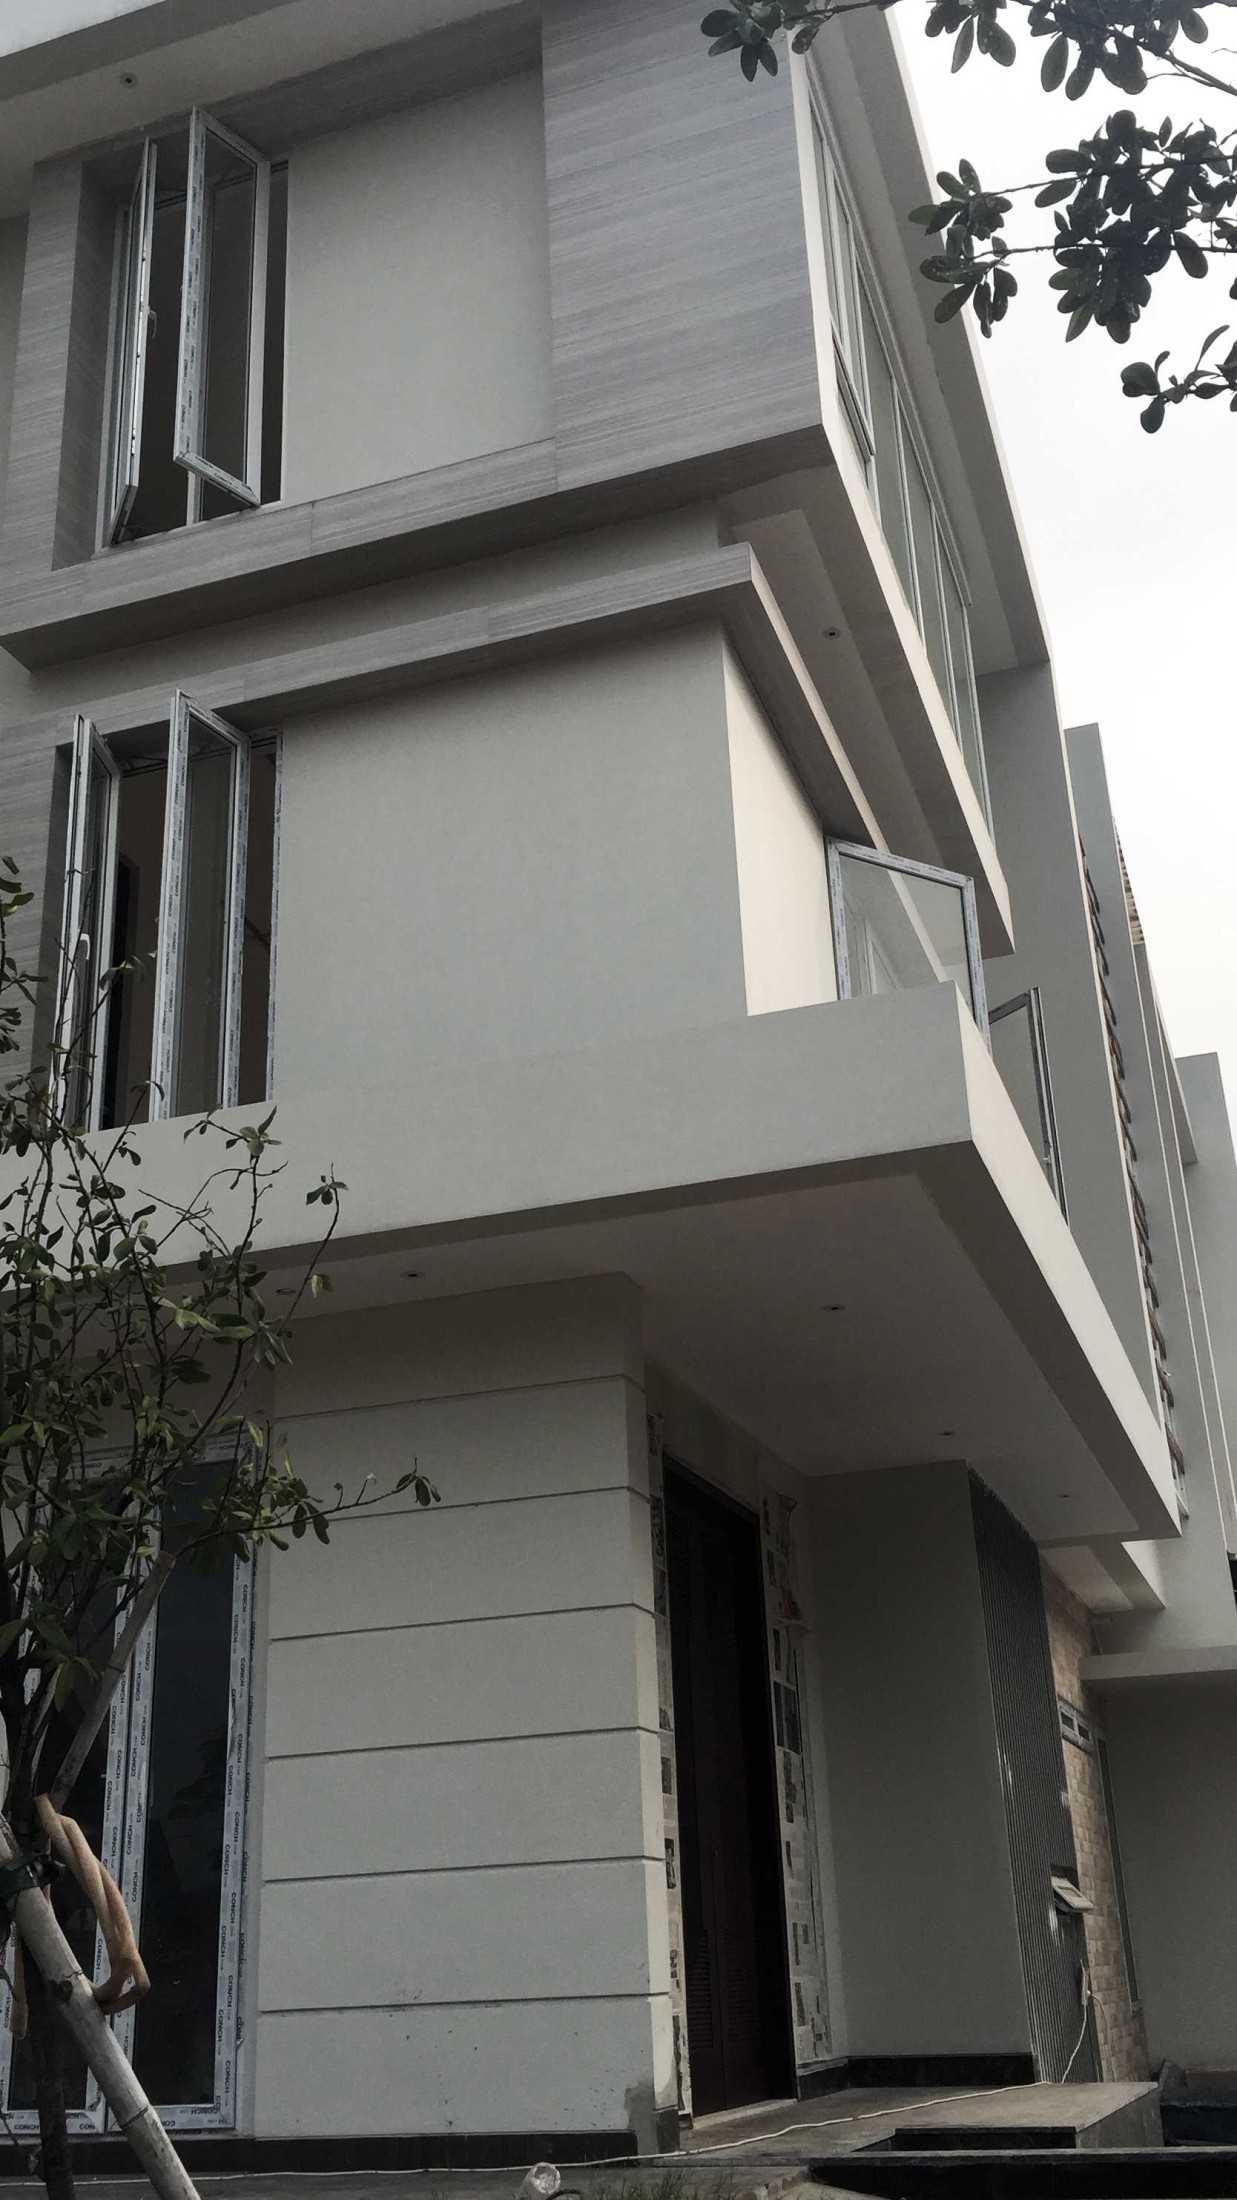 Einhaus Luckypark Residence Unnamed Road, Rt.7/rw.3, Kapuk Muara, Penjaringan, North Jakarta City, Jakarta 14460, Indonesia Unnamed Road, Rt.7/rw.3, Kapuk Muara, Penjaringan, North Jakarta City, Jakarta 14460, Indonesia Einhaus-Luckypark-Residence  105793